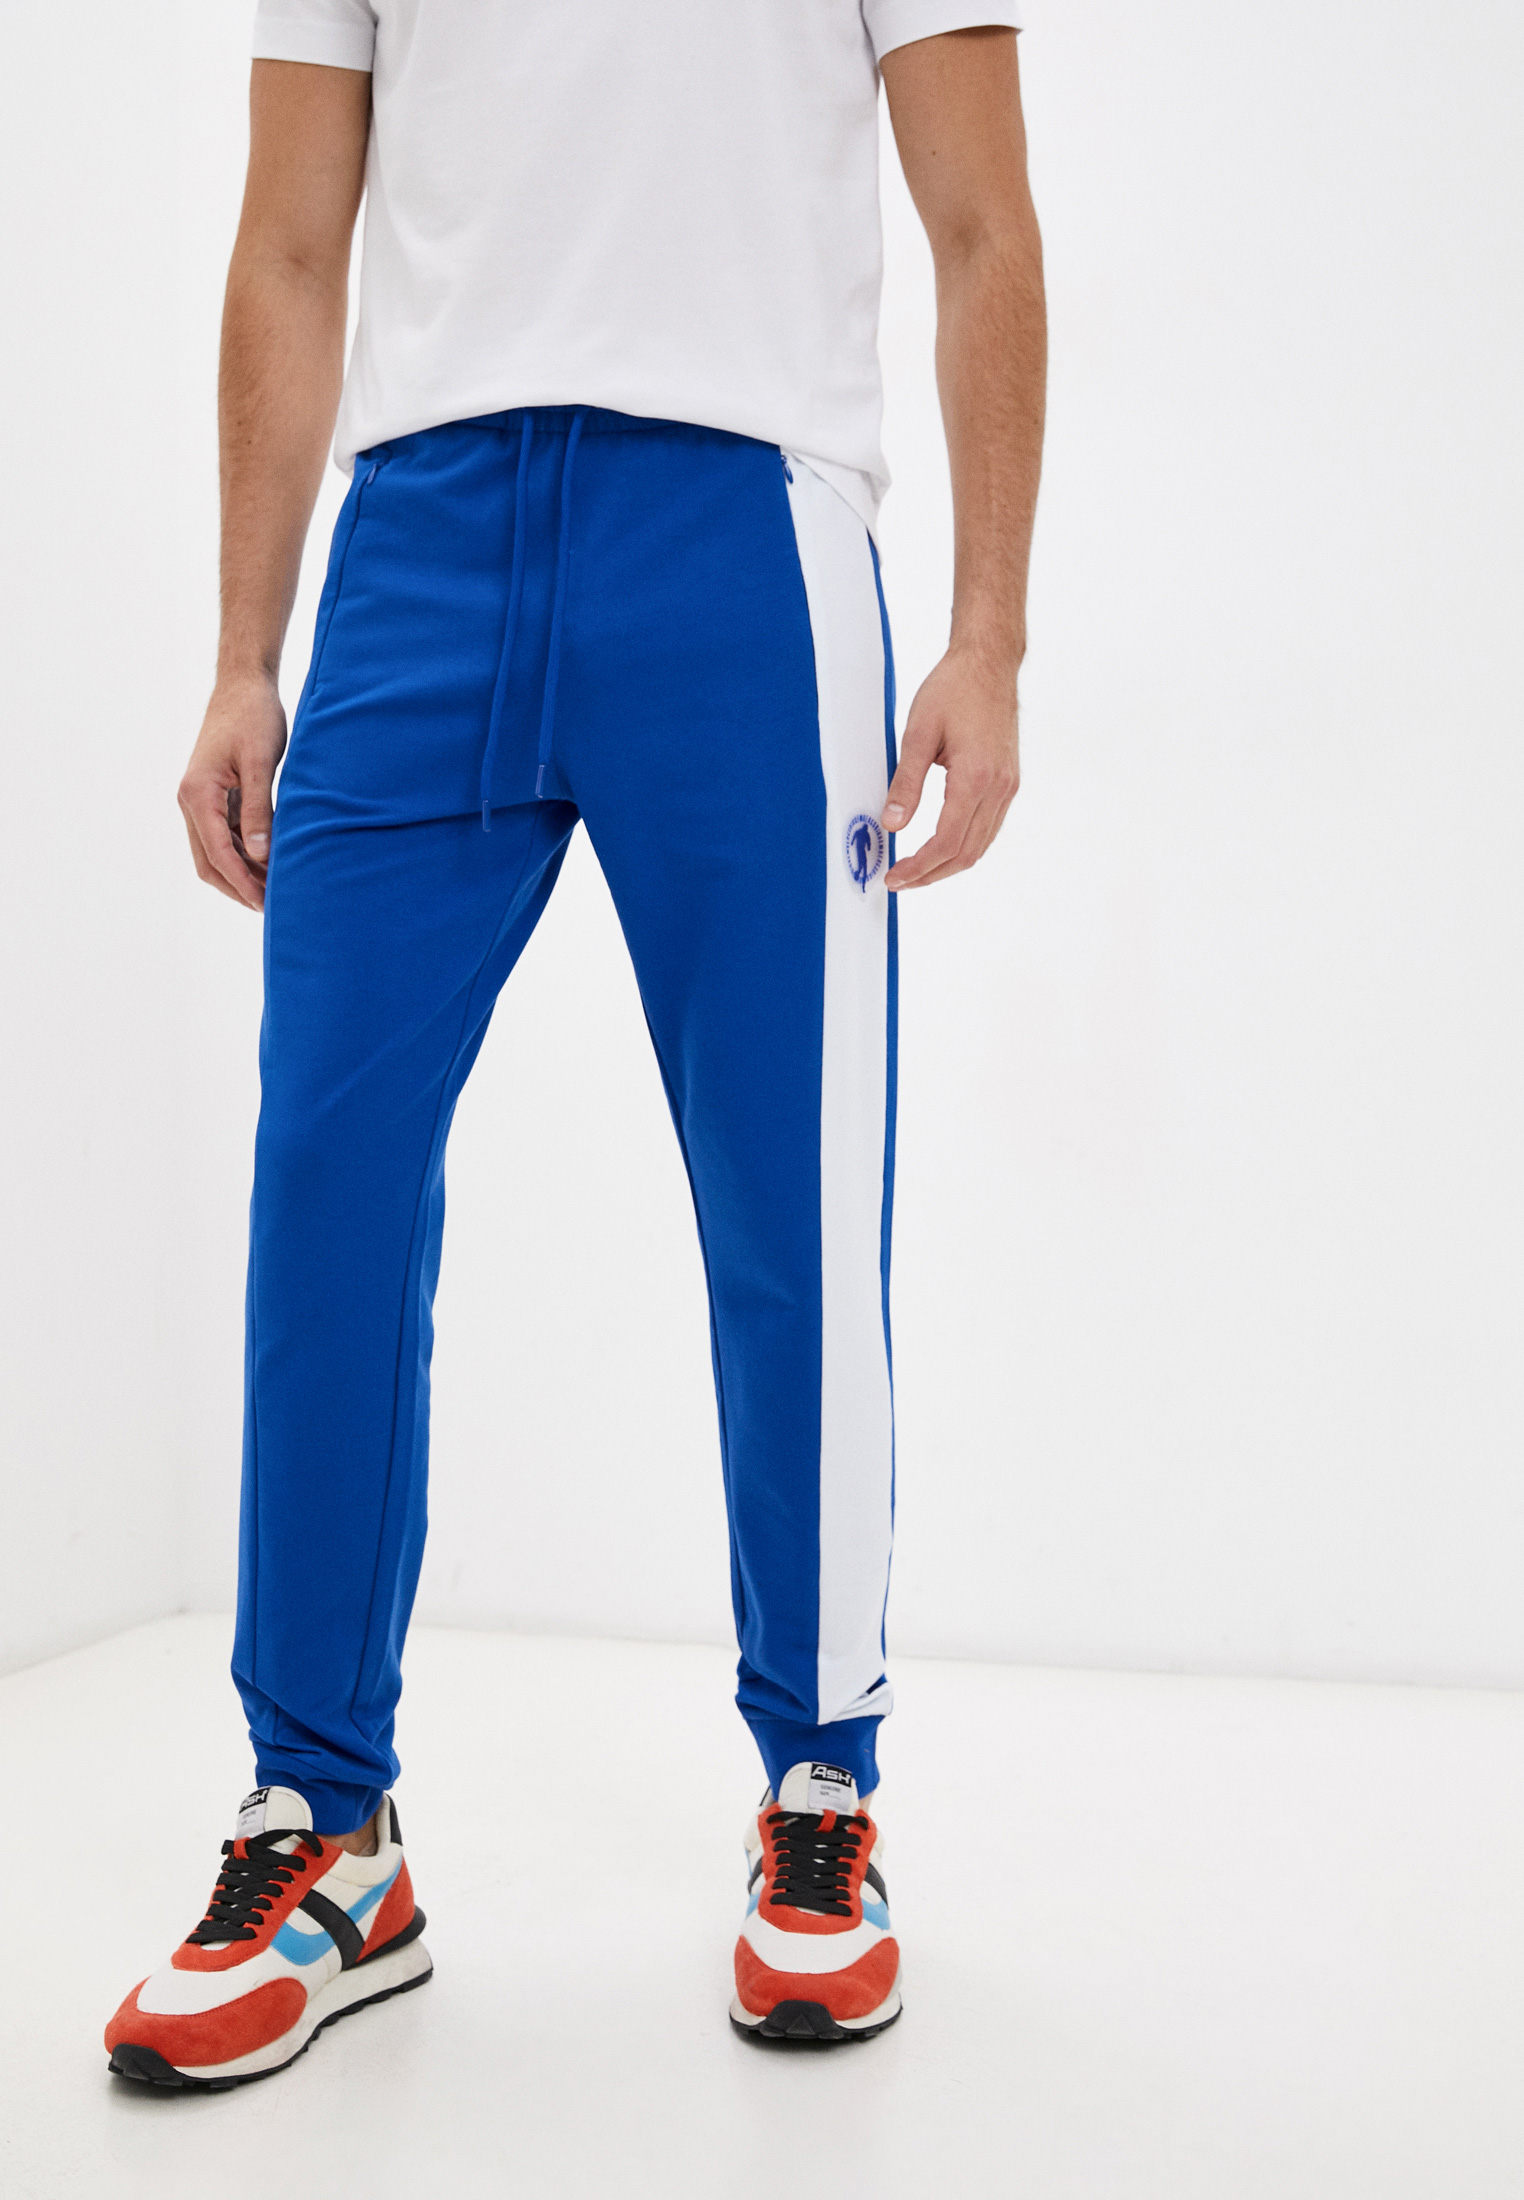 Мужские спортивные брюки Bikkembergs (Биккембергс) C 1 095 2B E 1978